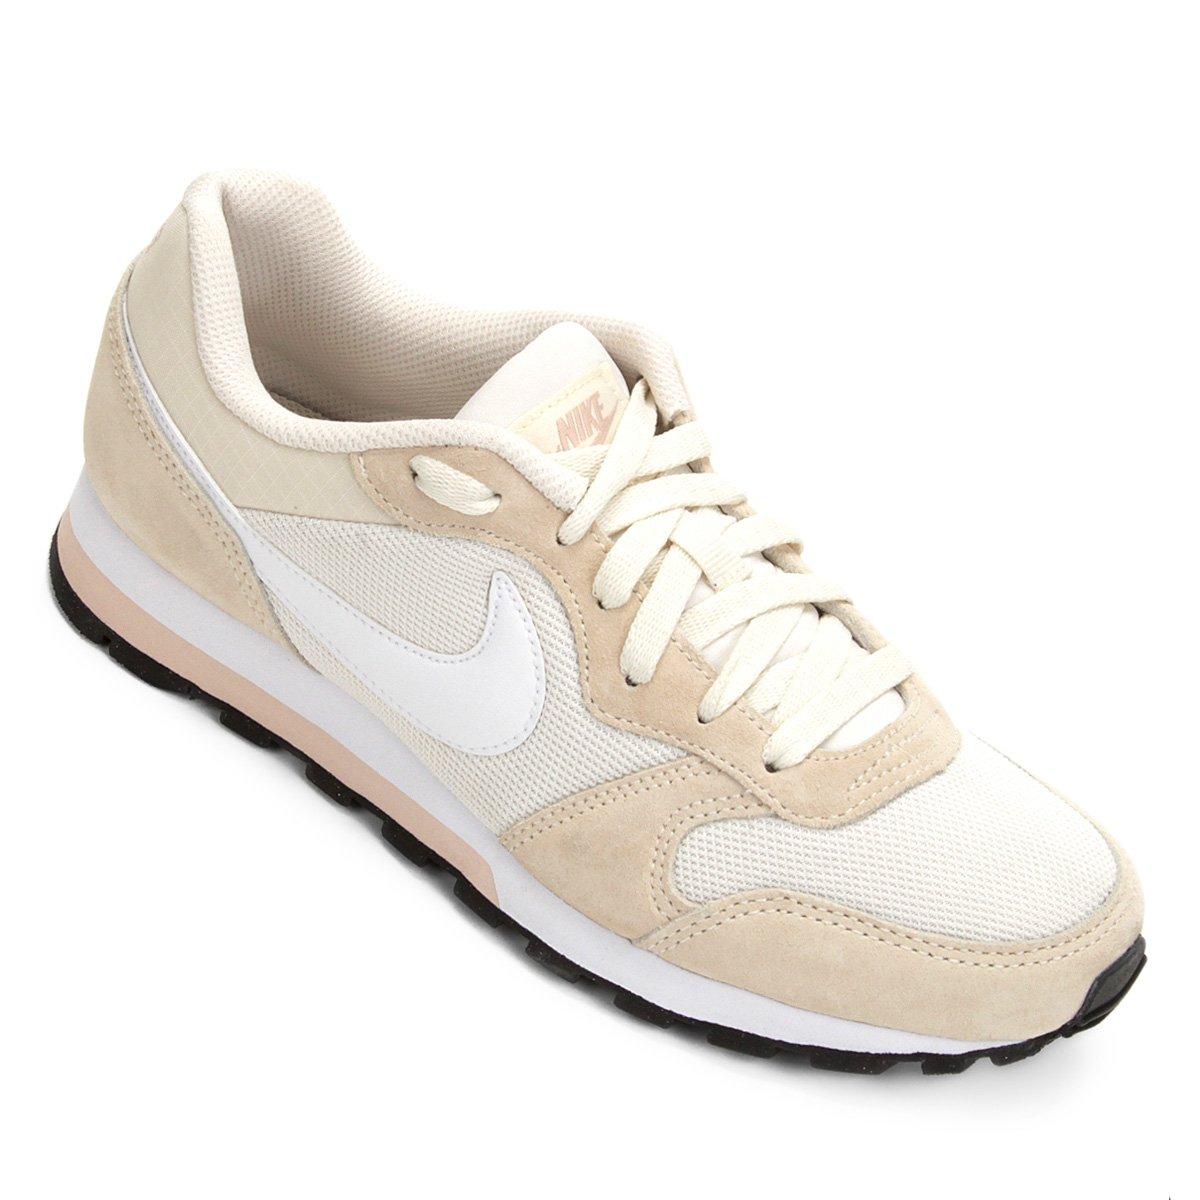 2b10f6a333b Tênis Nike Md Runner 2 Feminino - Bege e Branco - Compre Agora ...